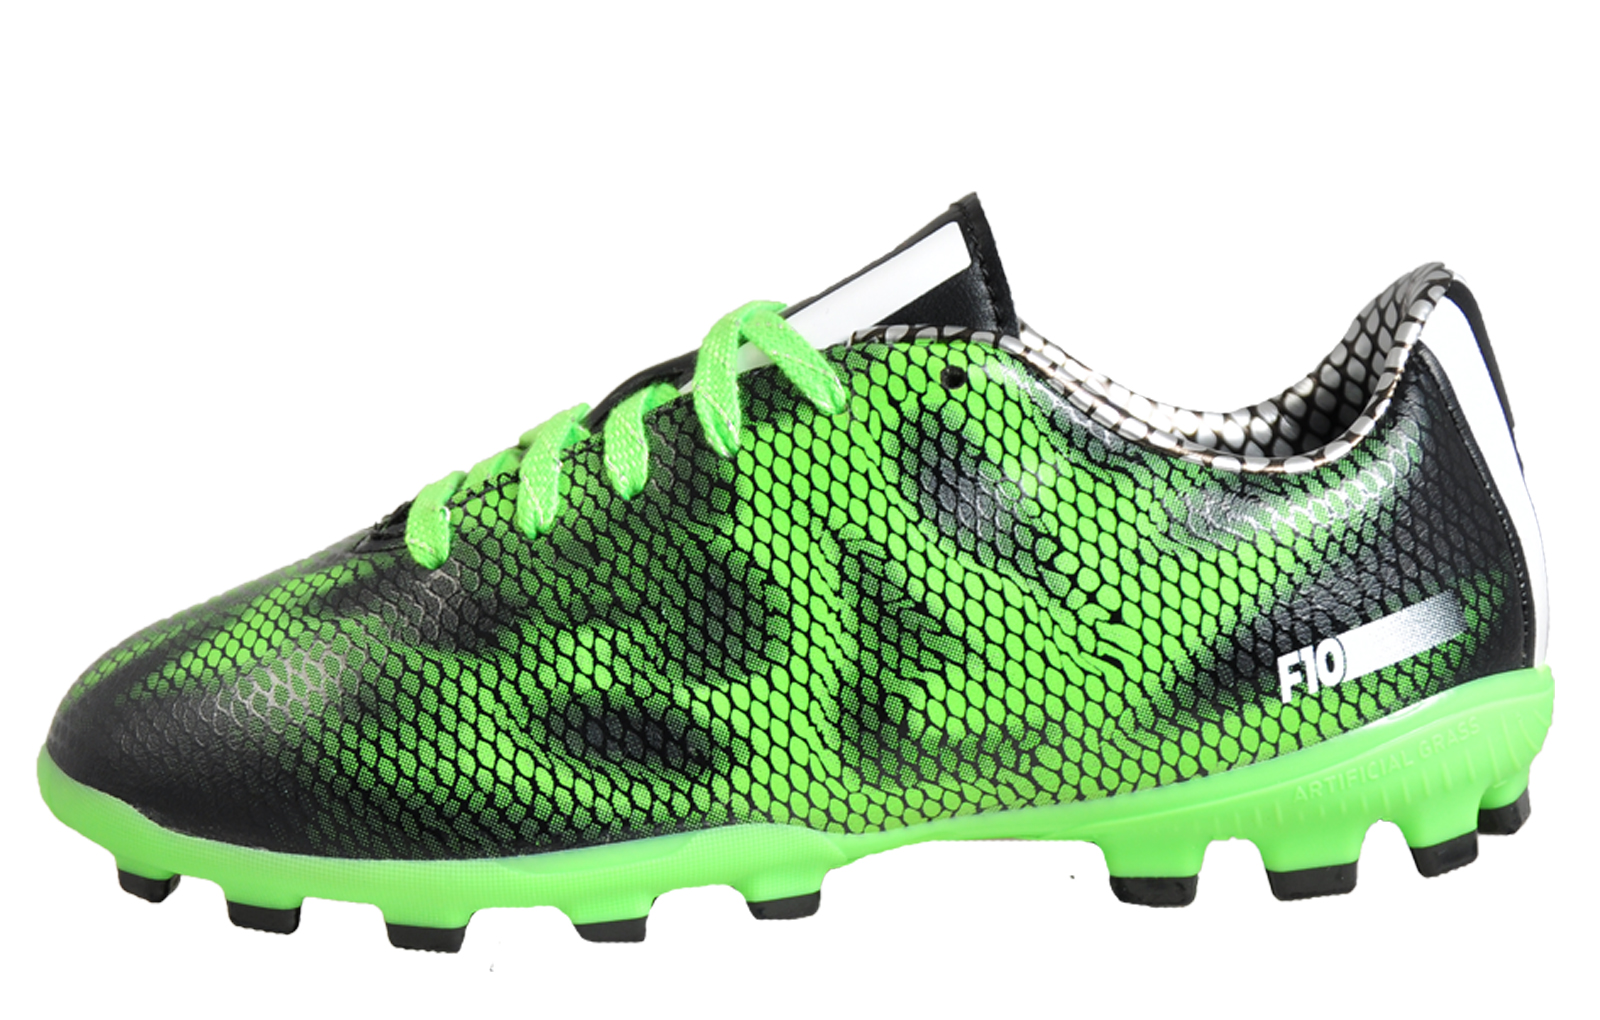 Adidas F10 AG Junior Kids Boys Premier Pro Football Boots  c5486721e4e3a